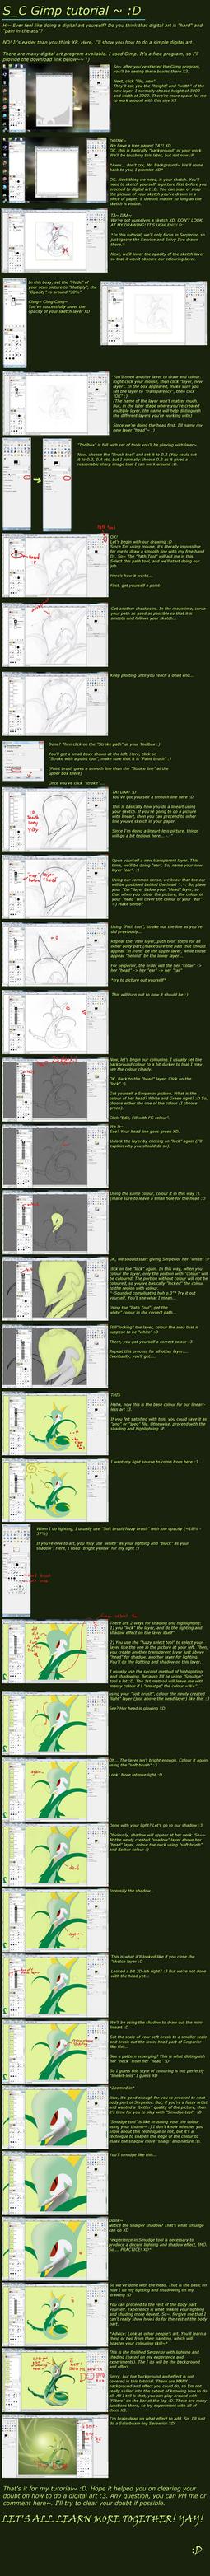 Line Art Gimp : Lineart less gimp tutorial by zymonasyh on deviantart